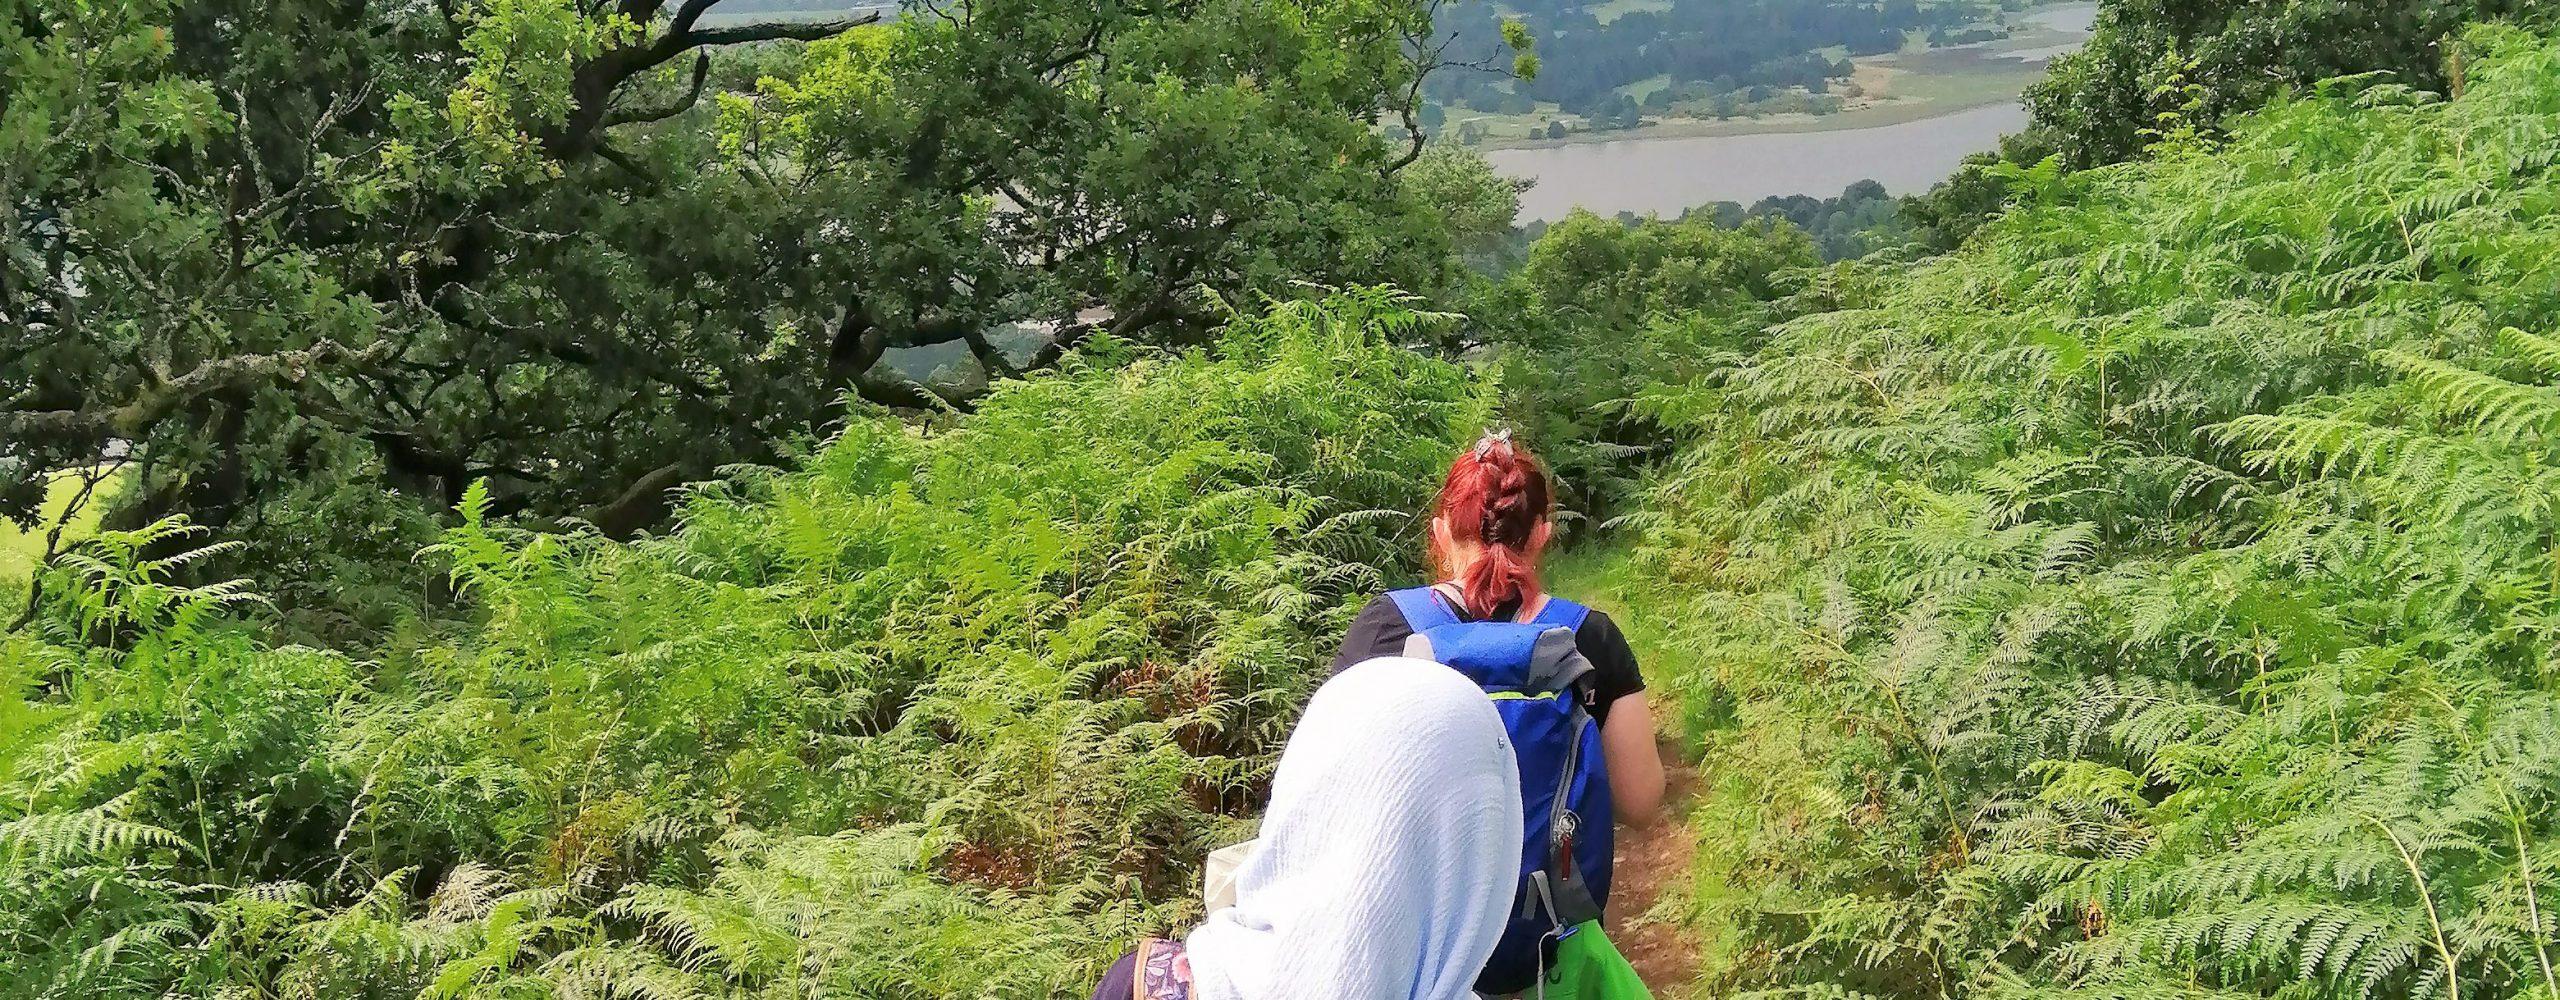 Following walkers through ferns